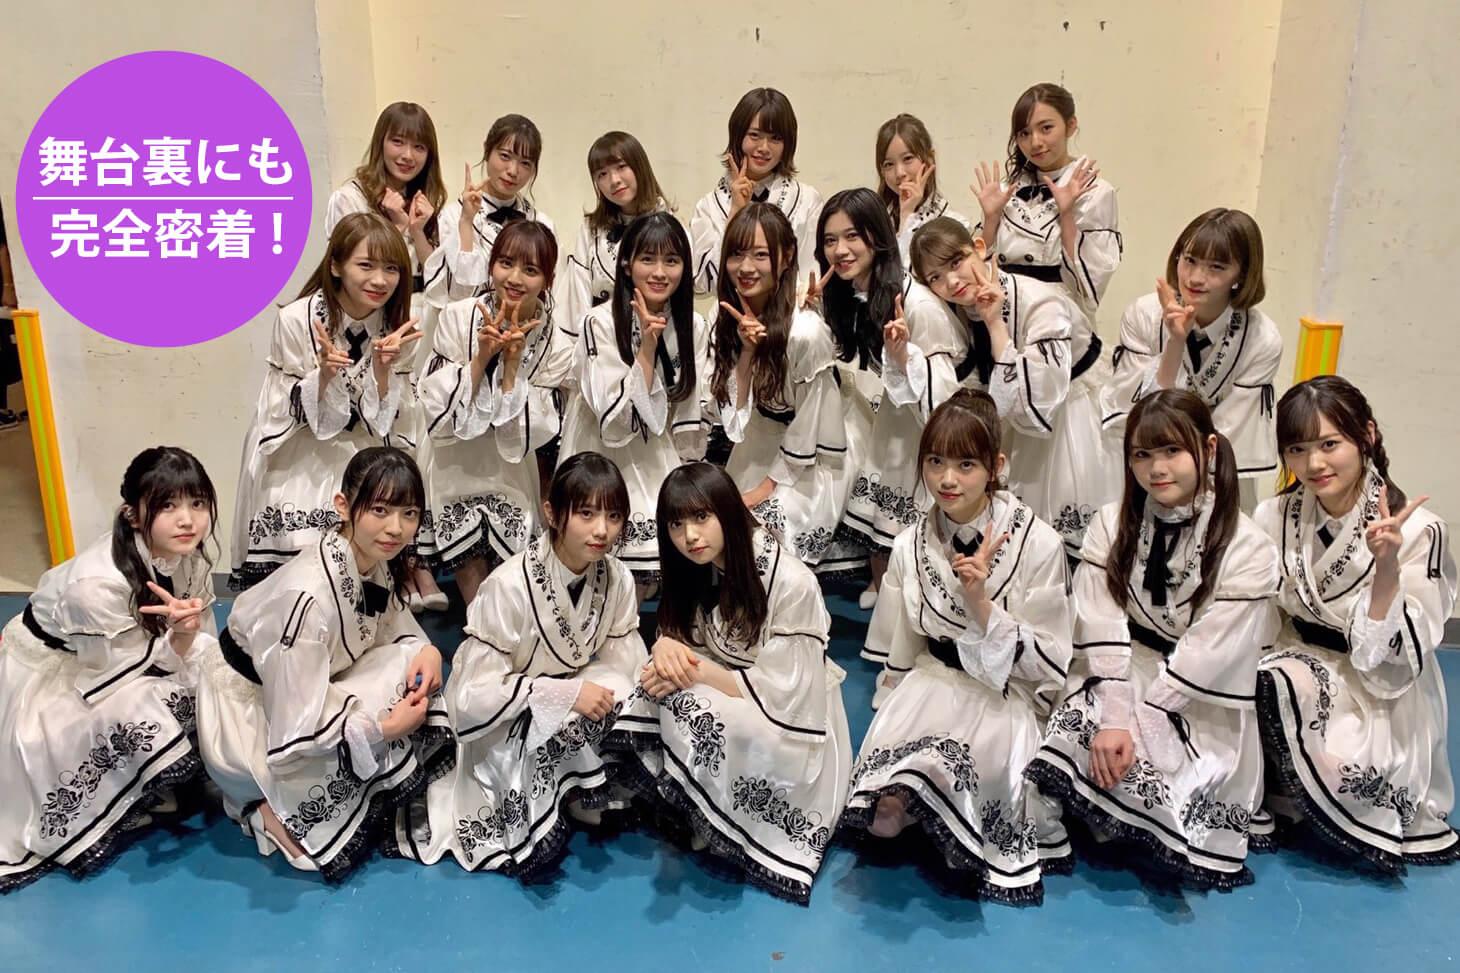 「乃木坂46 meets Asia! ~台北ver.~」(MUSIC ON! TV)